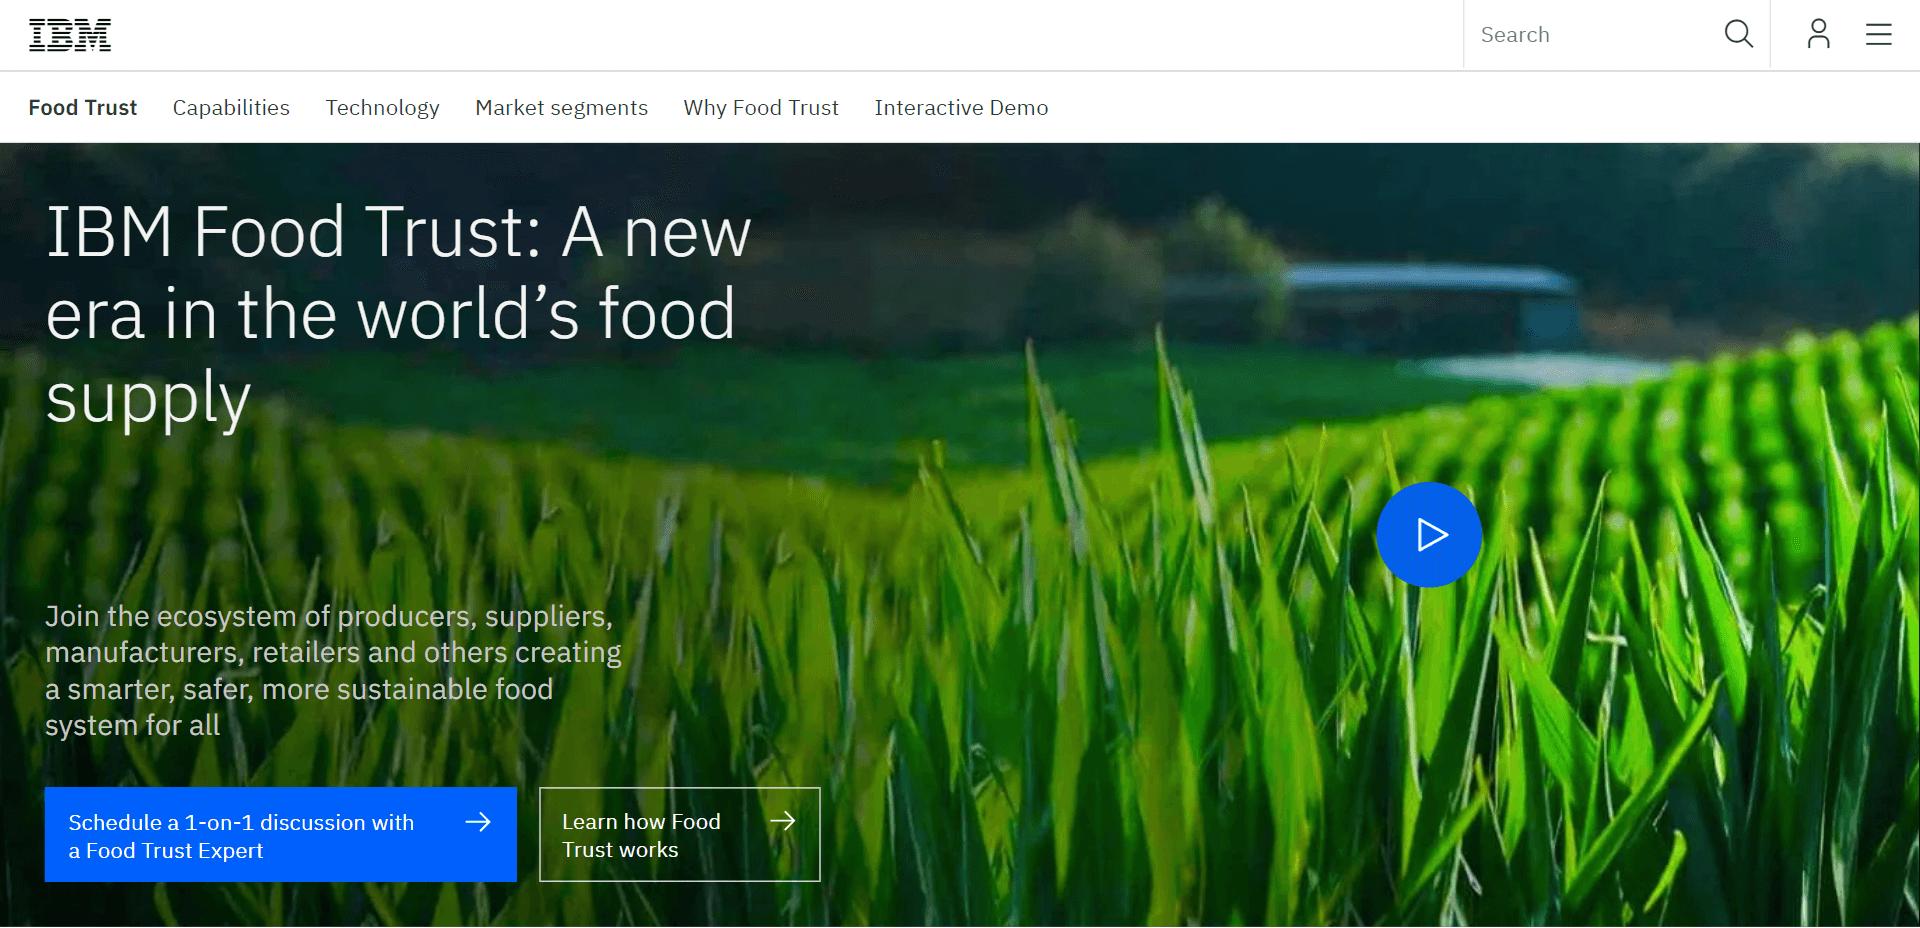 ibm-food-trust.png